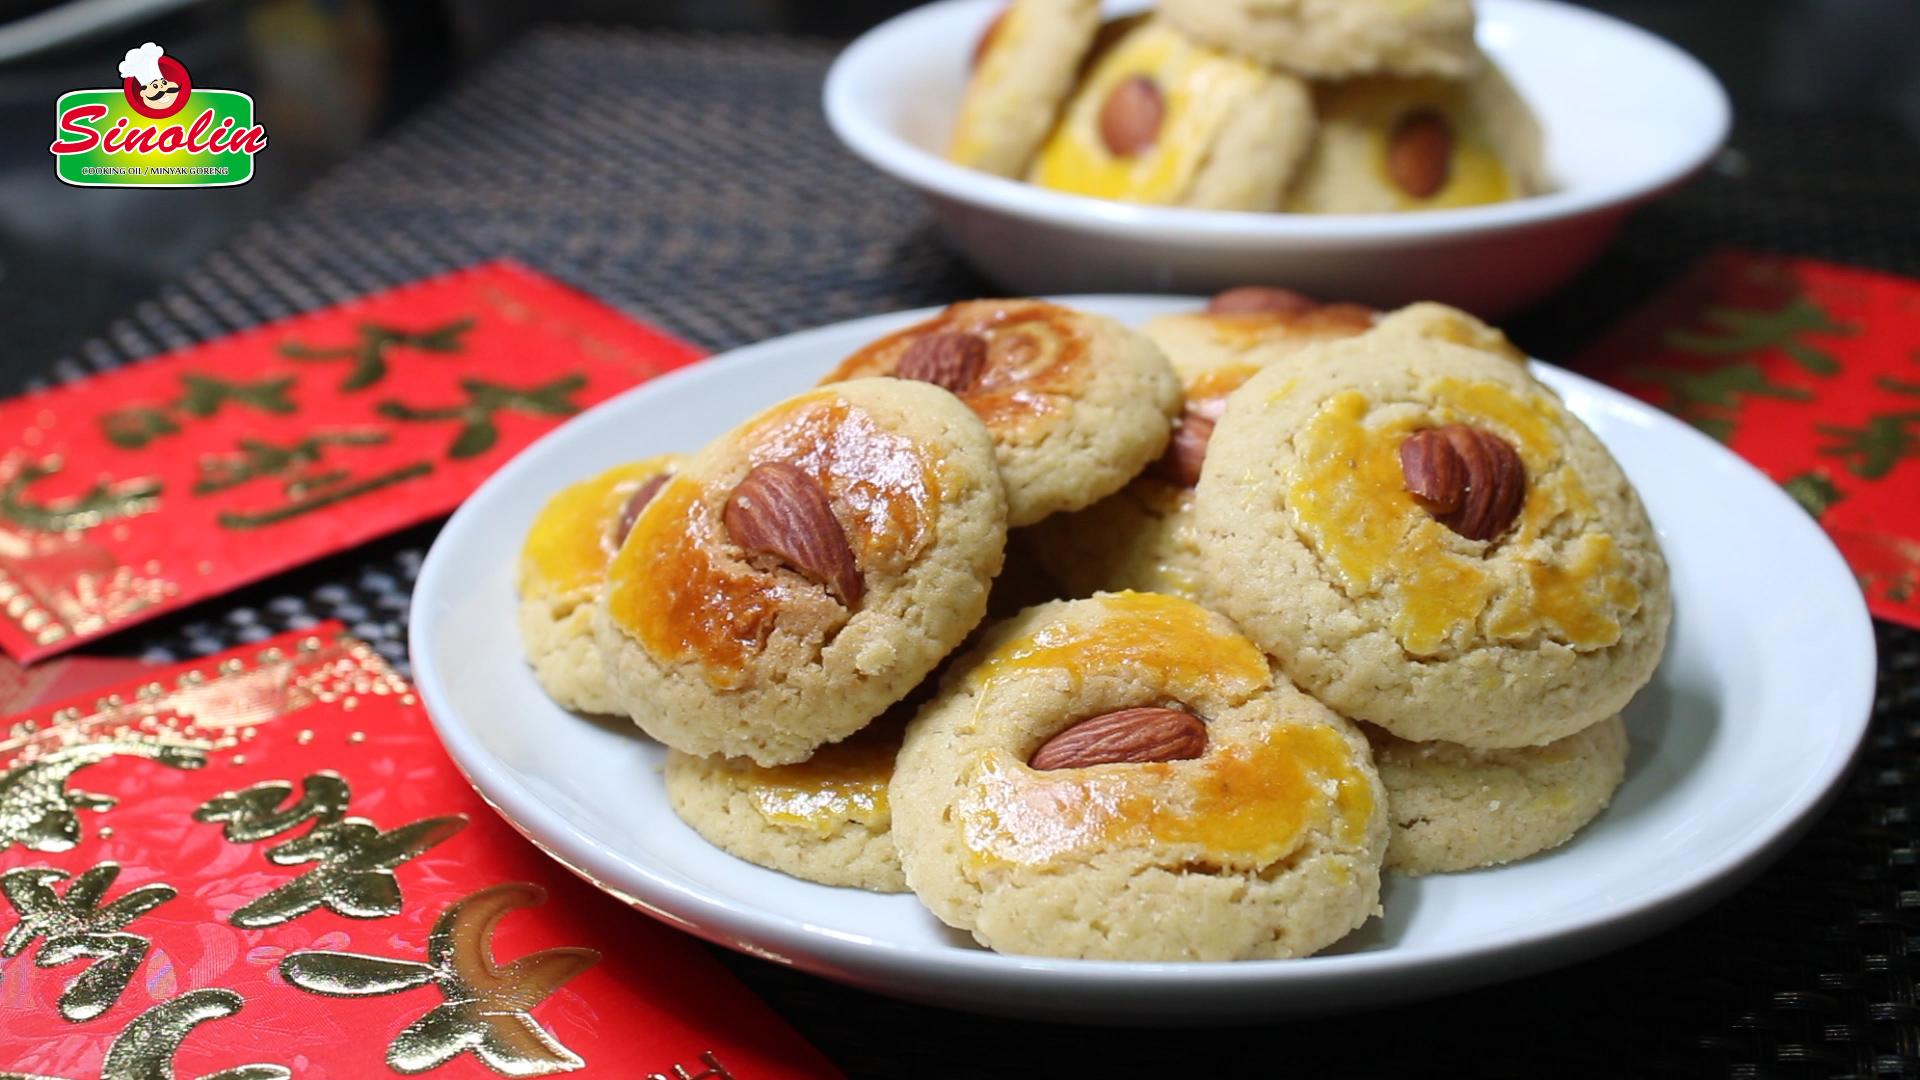 GLUTEN-FREE CHINESE ALMOND COOKIES by Dapur Sinolin